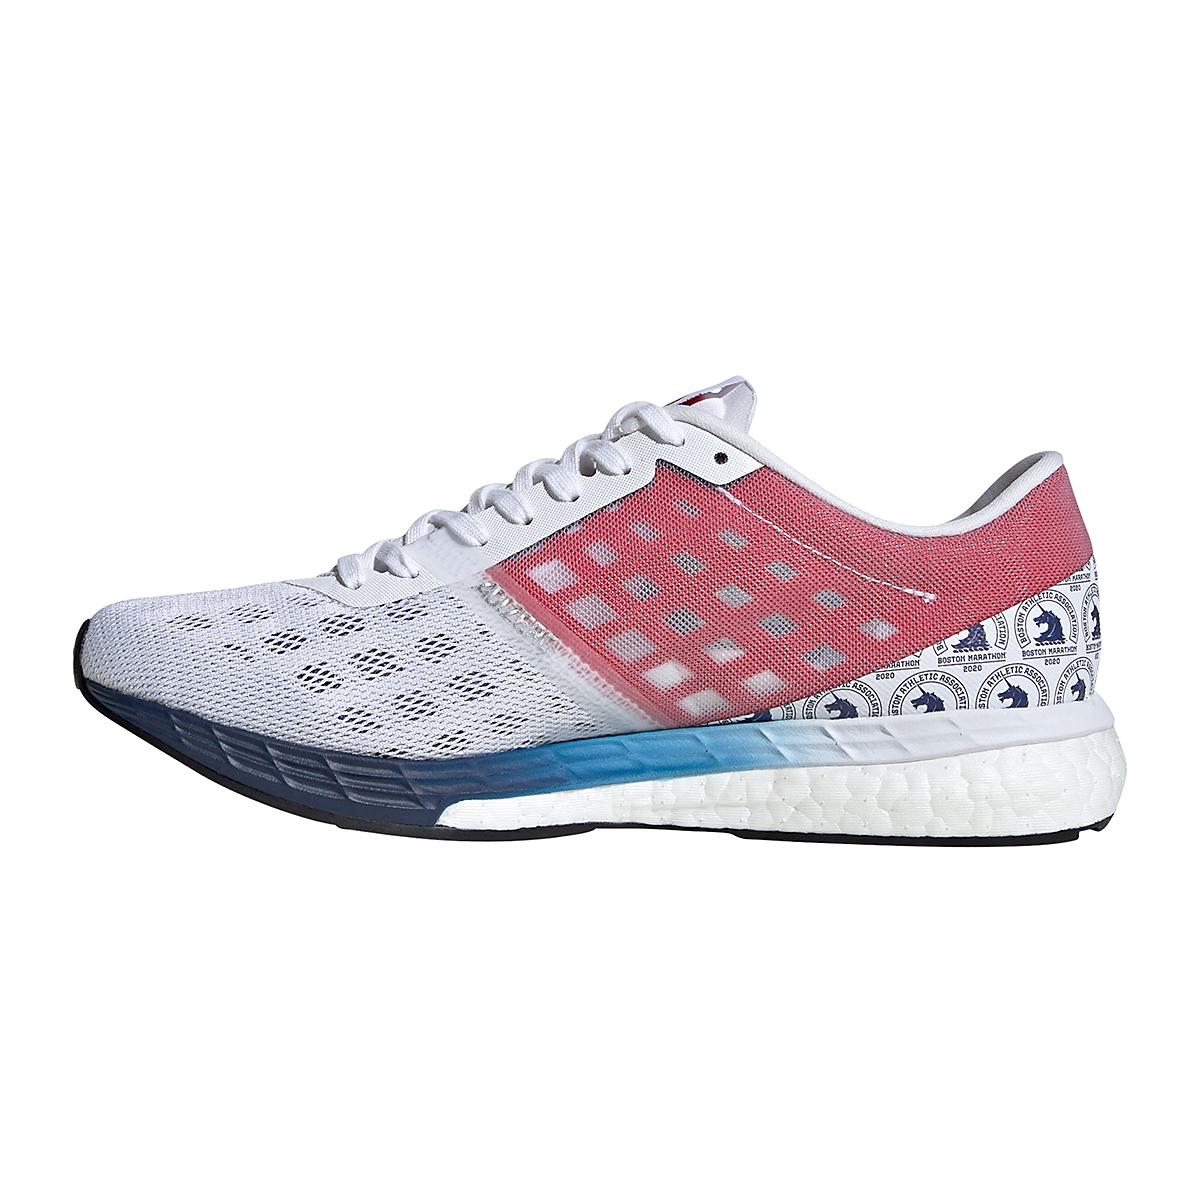 Women's Adidas Adizero Boston 9 Running Shoe - Color: Cloud White/Silver Metallic/Scarlet - Size: 6.5 - Width: Regular, Cloud White/Silver Metallic/Scarlet, large, image 2